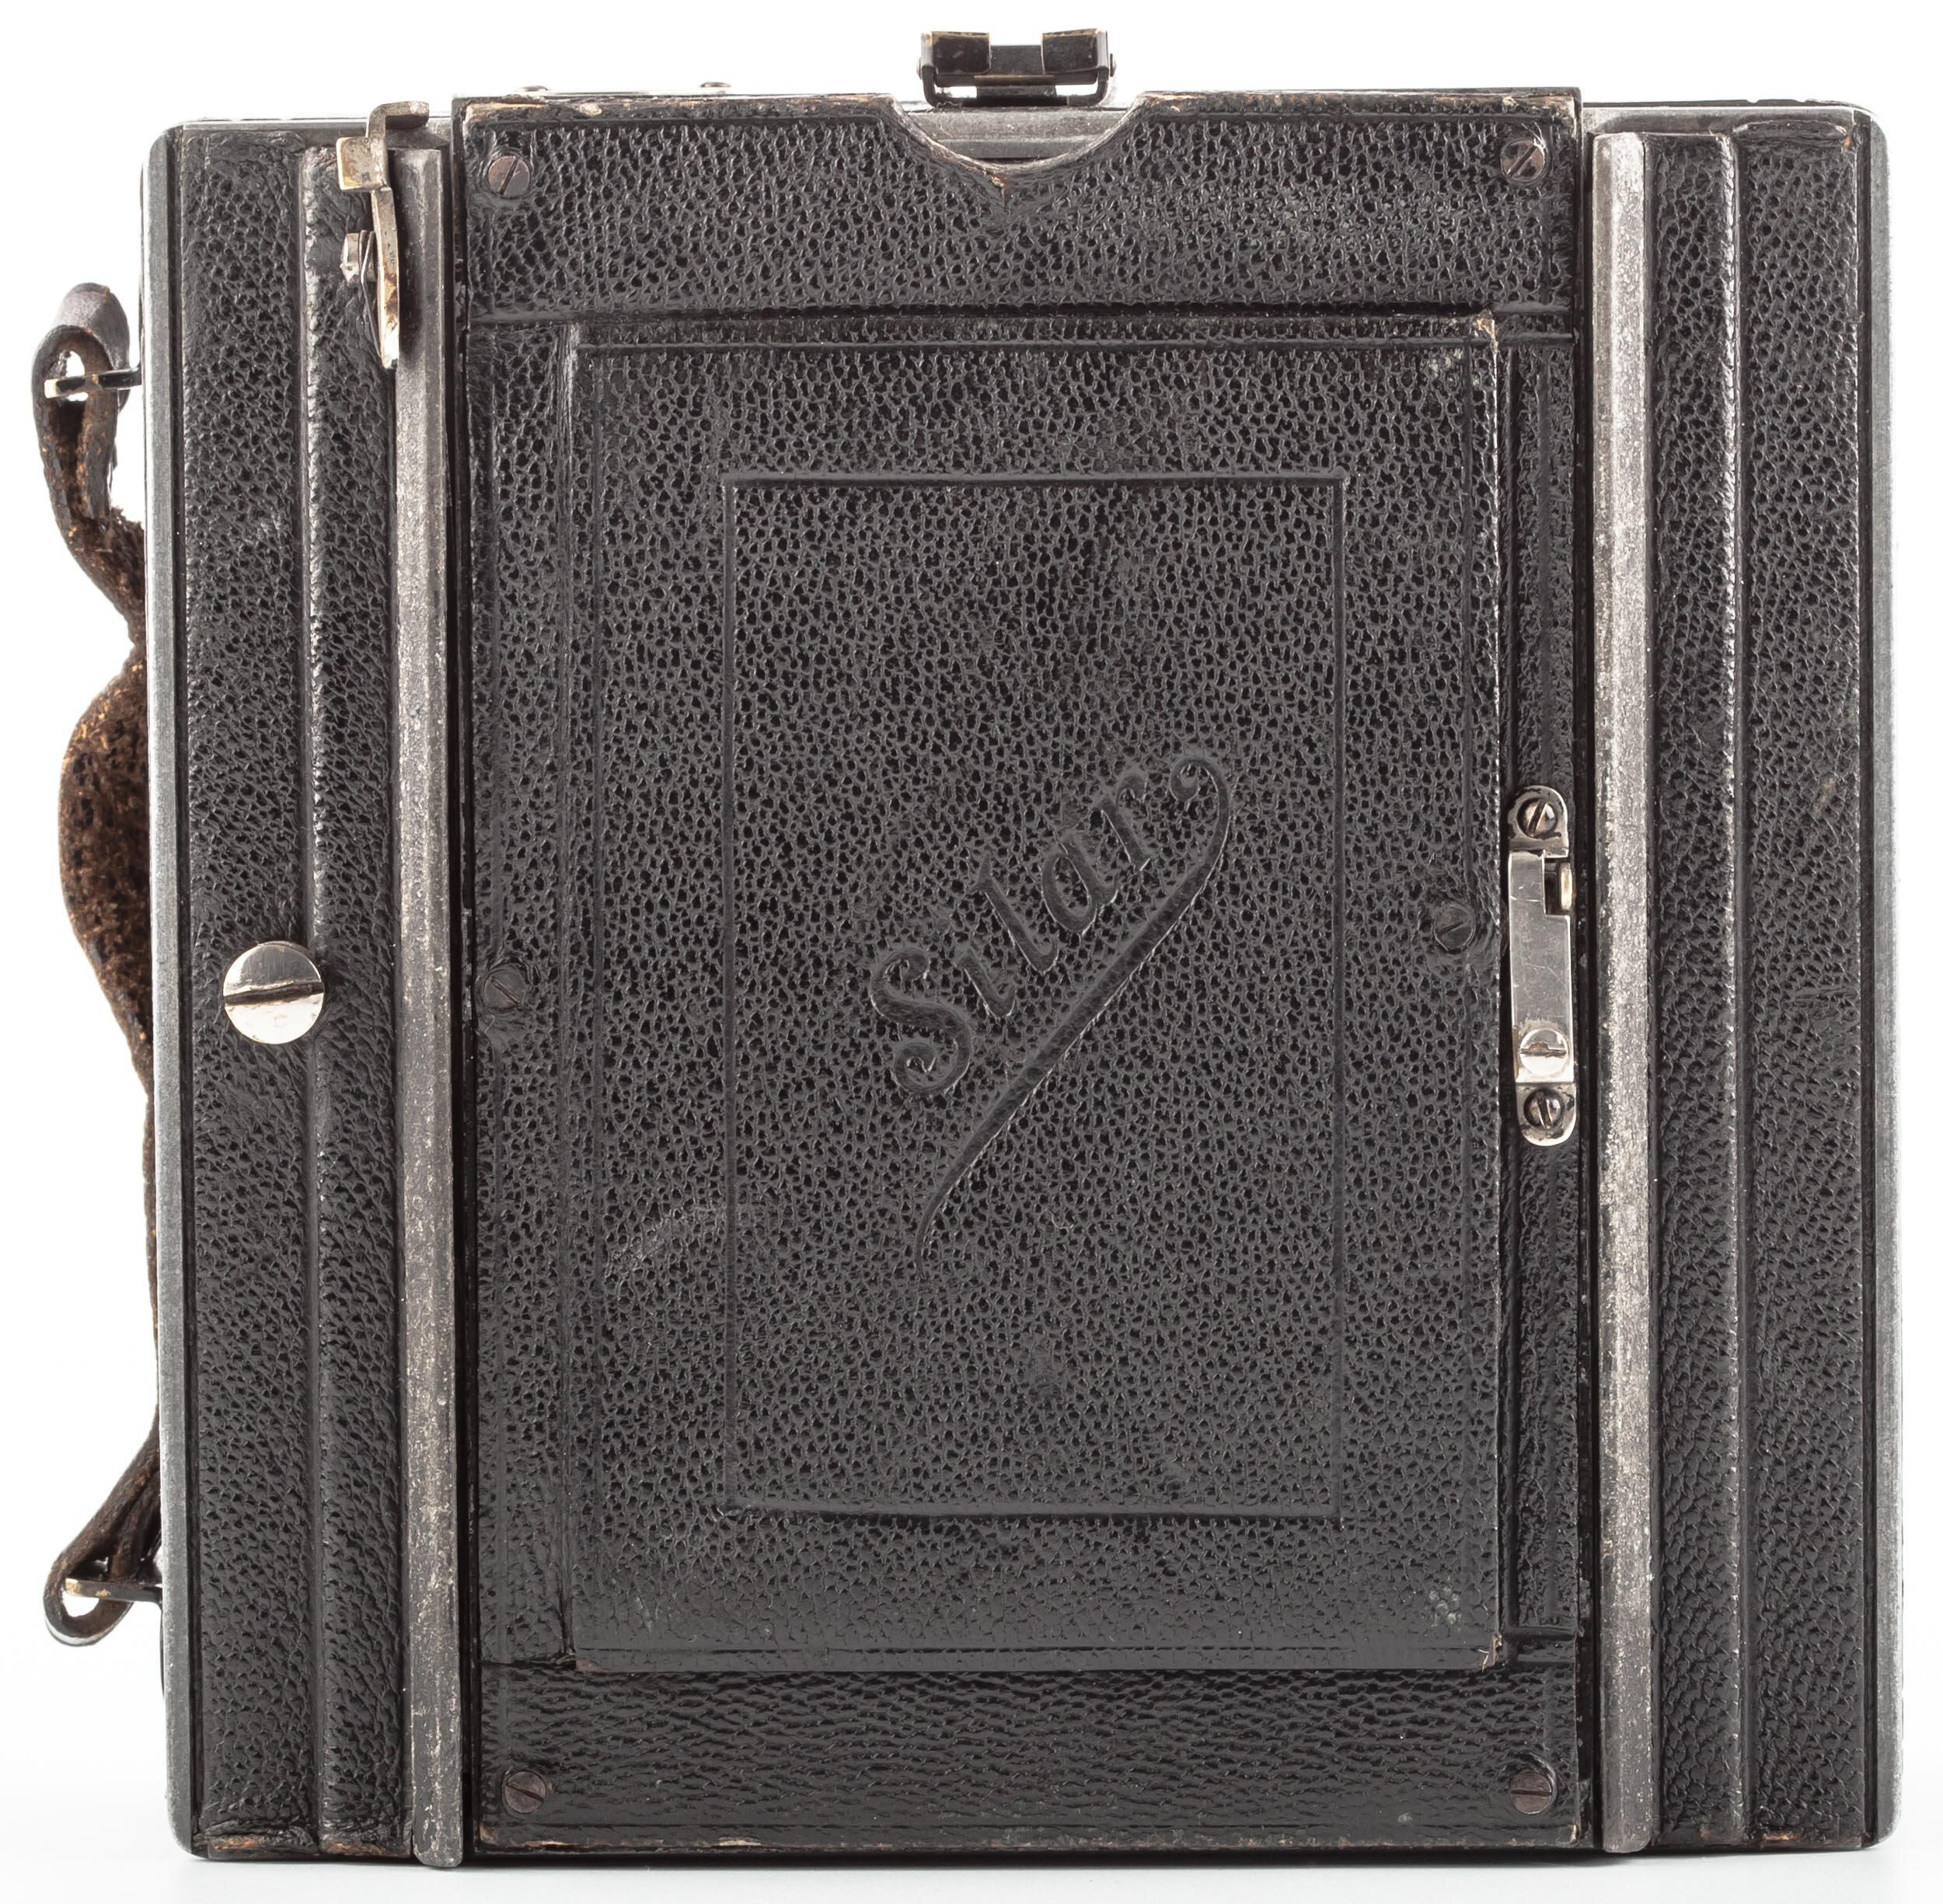 Meyer Silar Kamera 9x12 mit Meyer Satz-Plasmat 4,5/13,5 cm